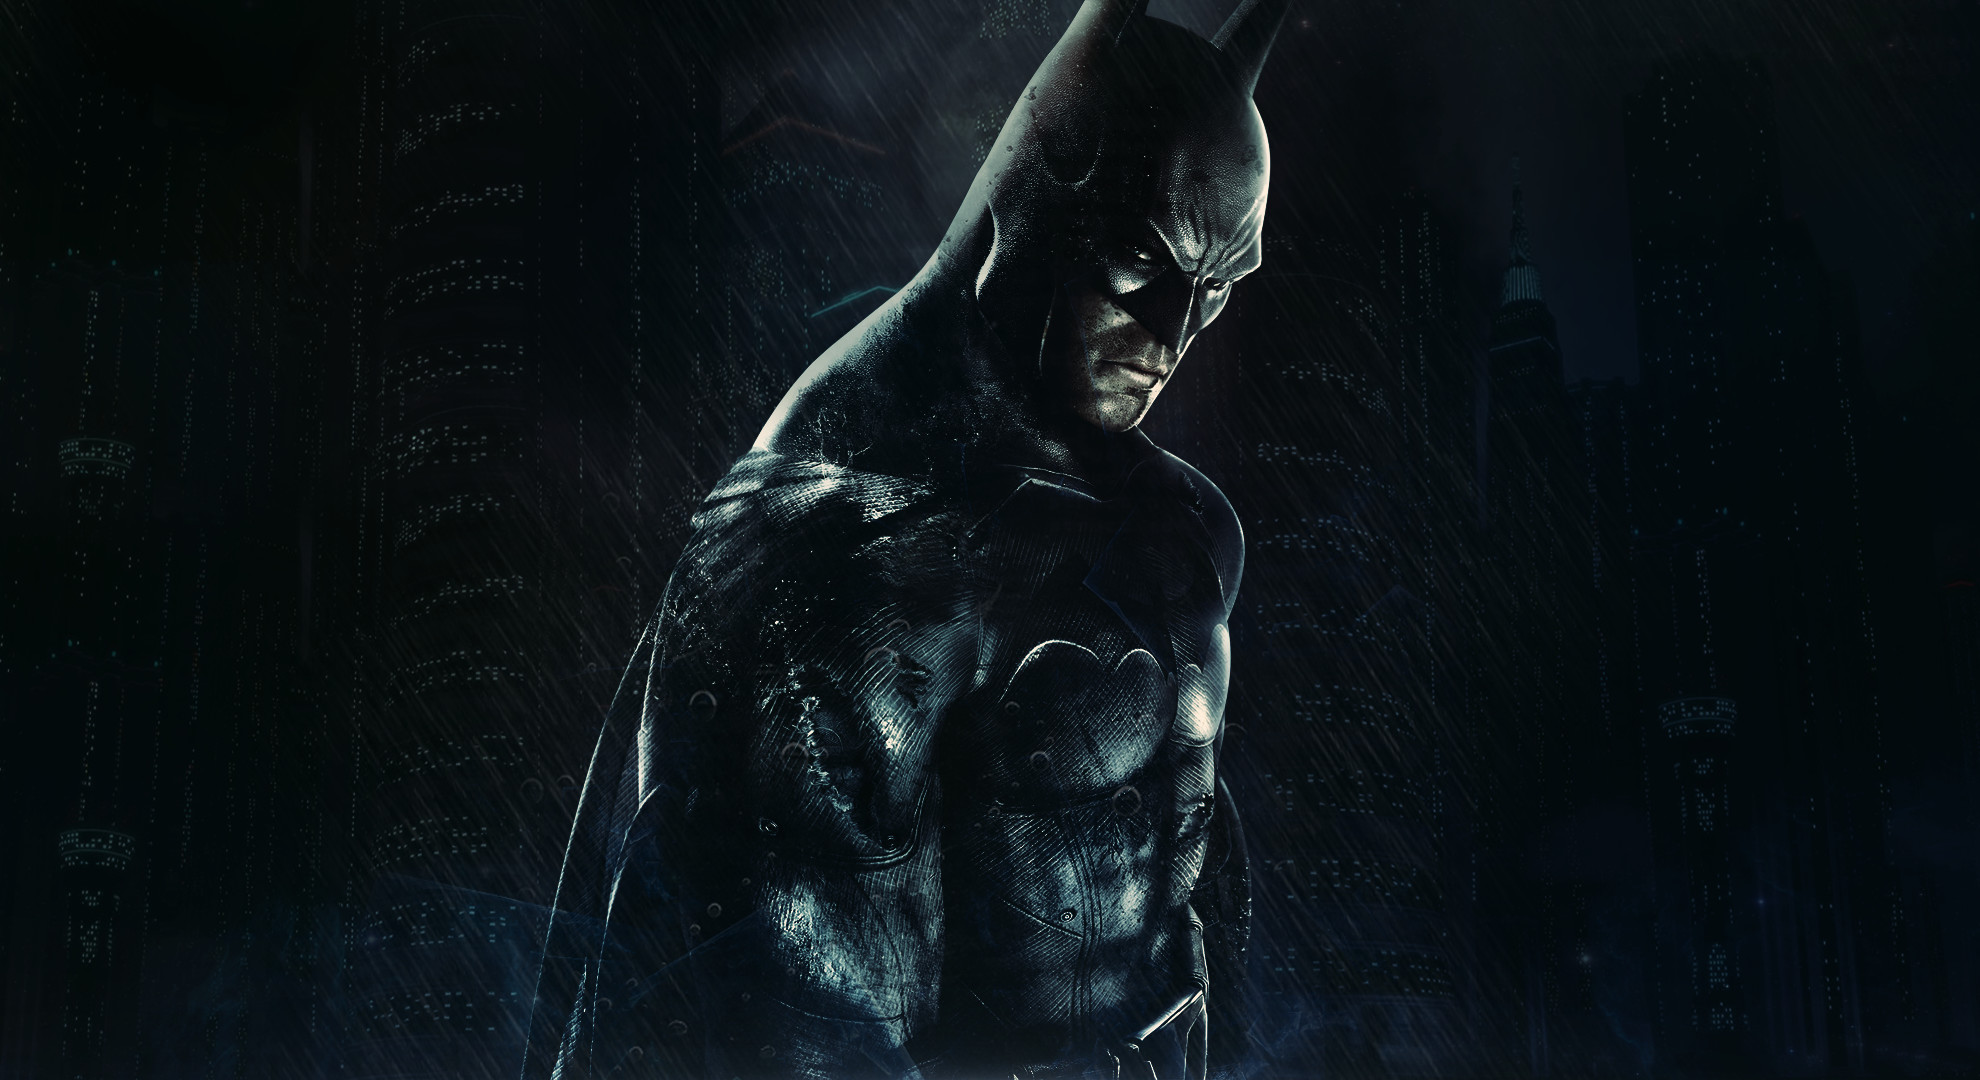 batman wallpaper hd backgrounds images